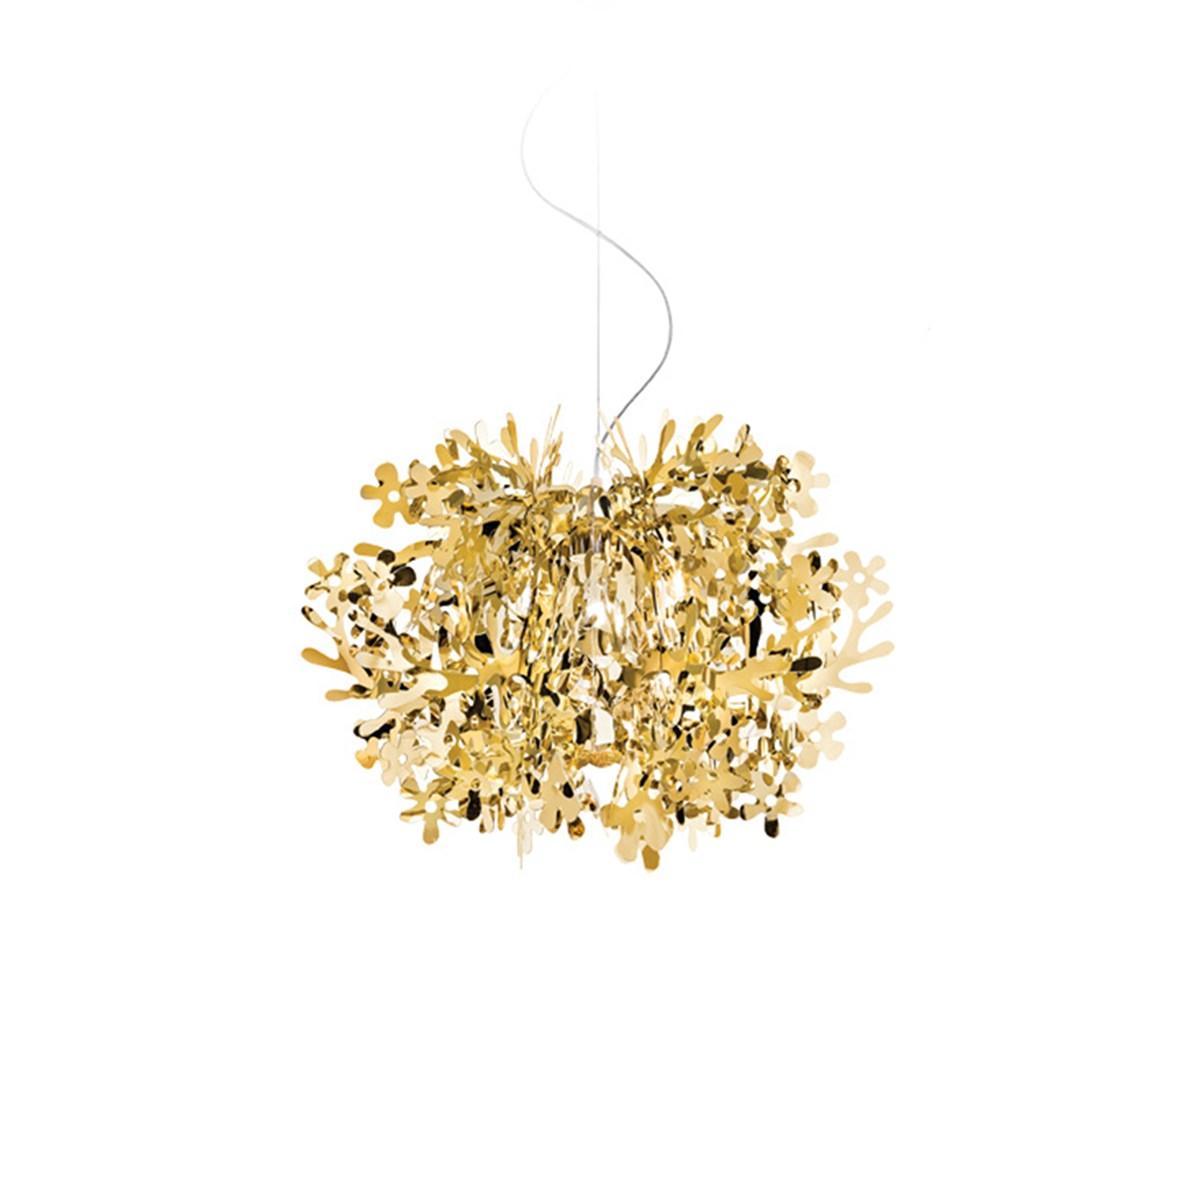 Slamp-Nigel-Coates-Fiorella-Gold-Silver-Copper-Matisse-1